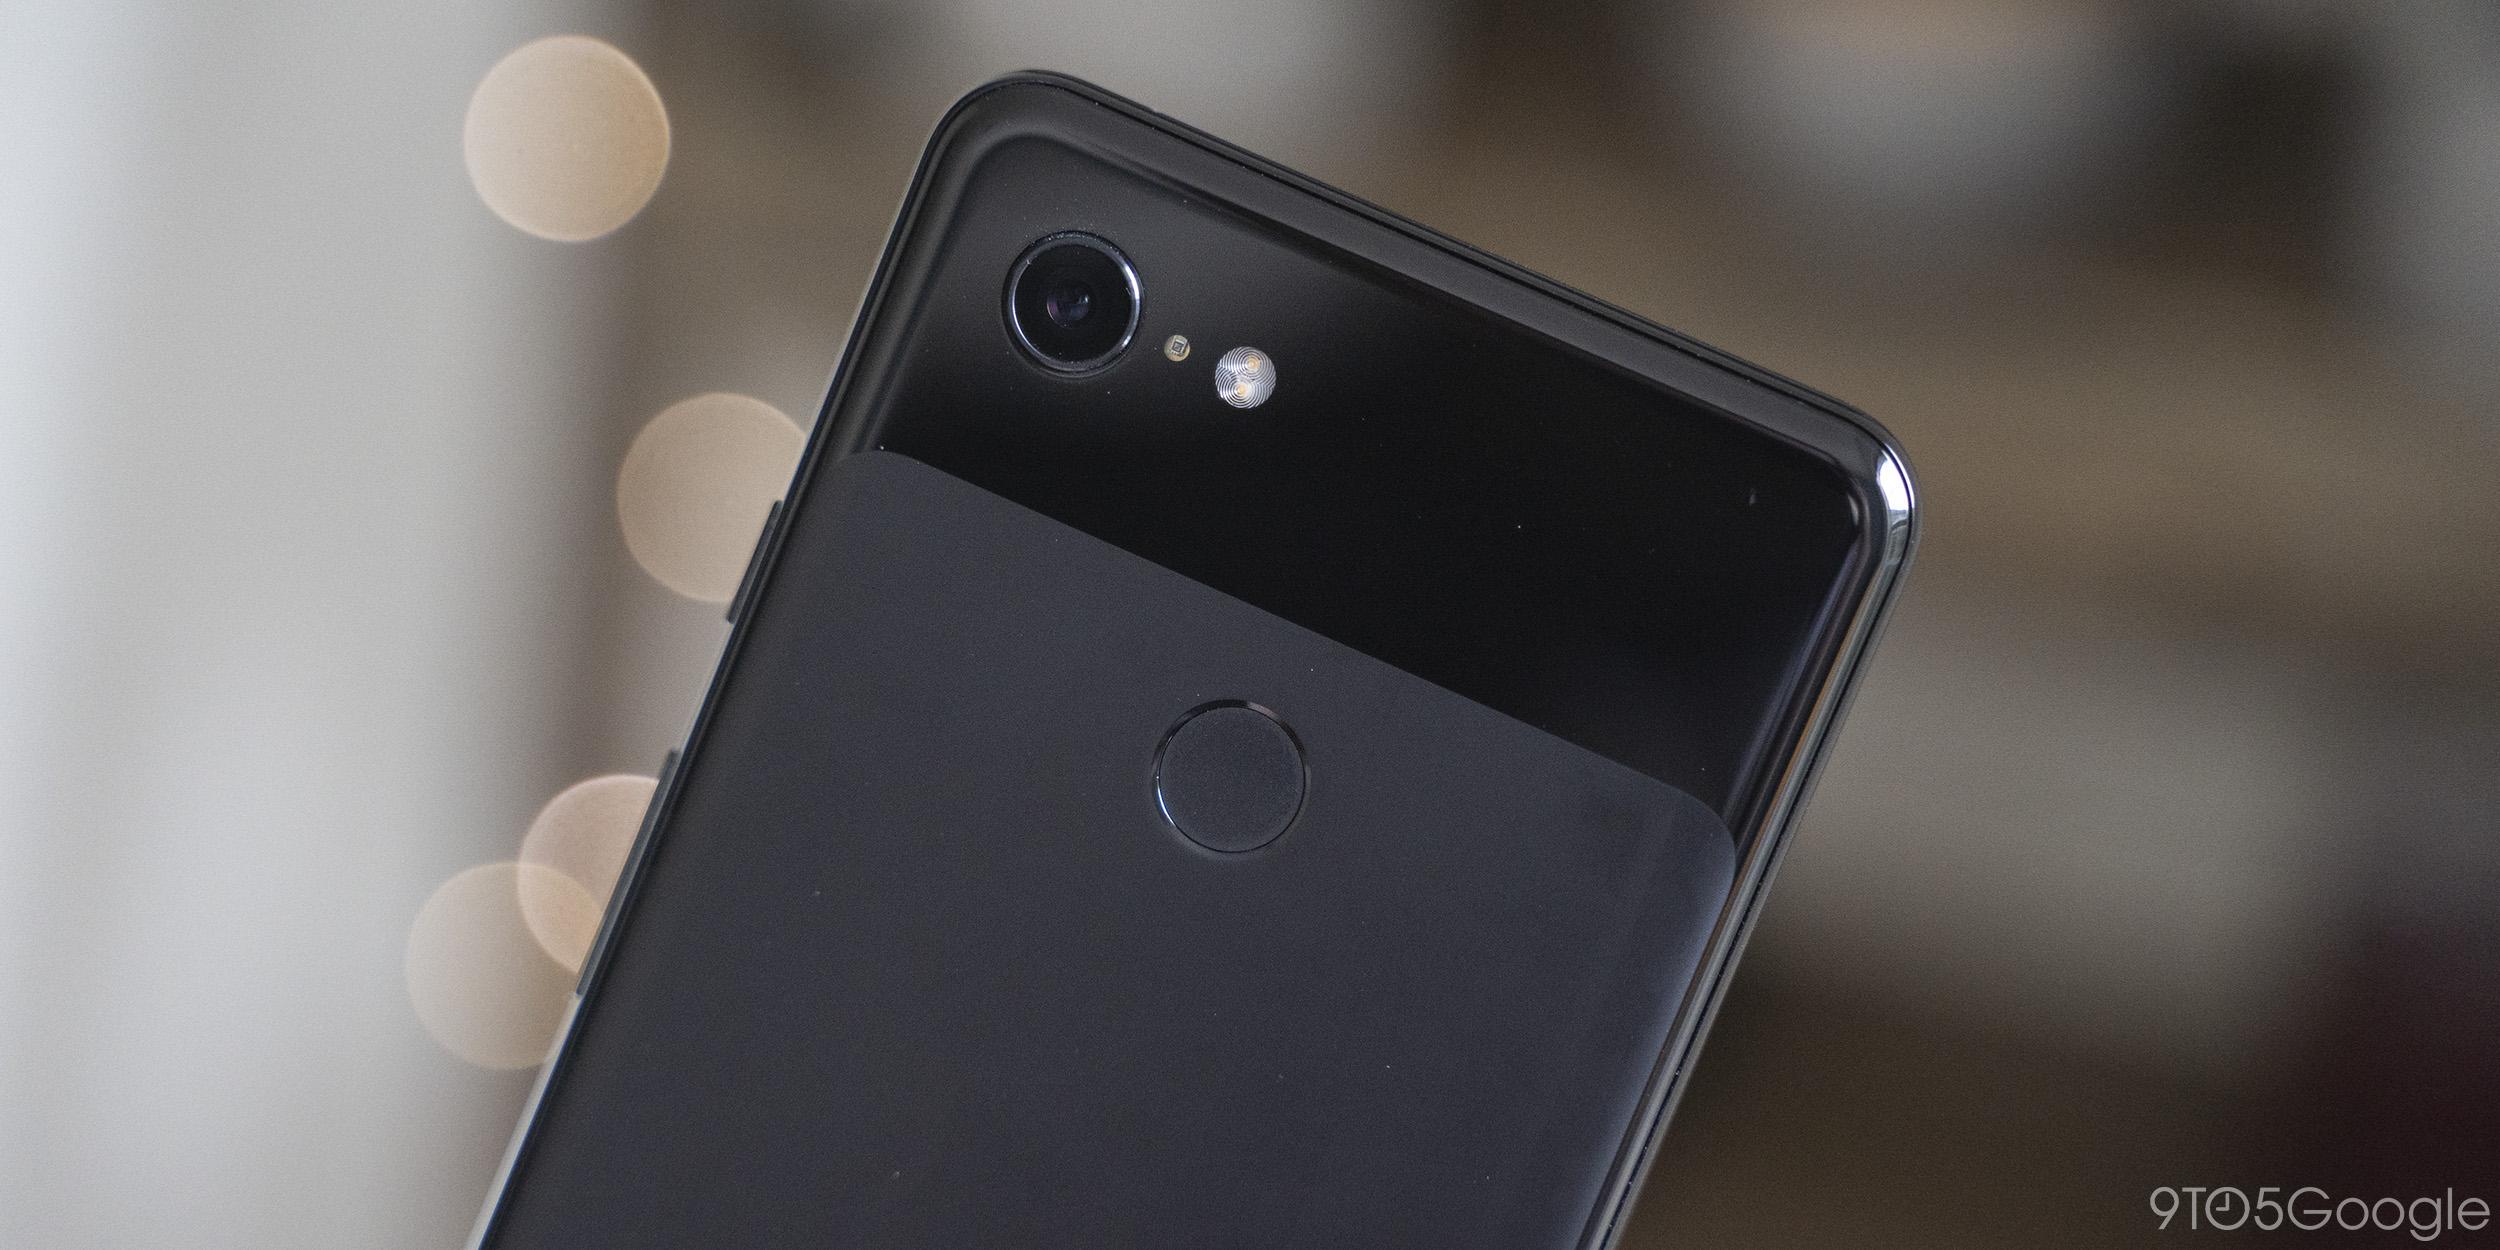 Google Store discounts Pixel 3 by $300 ahead of Pixel 4 unveil